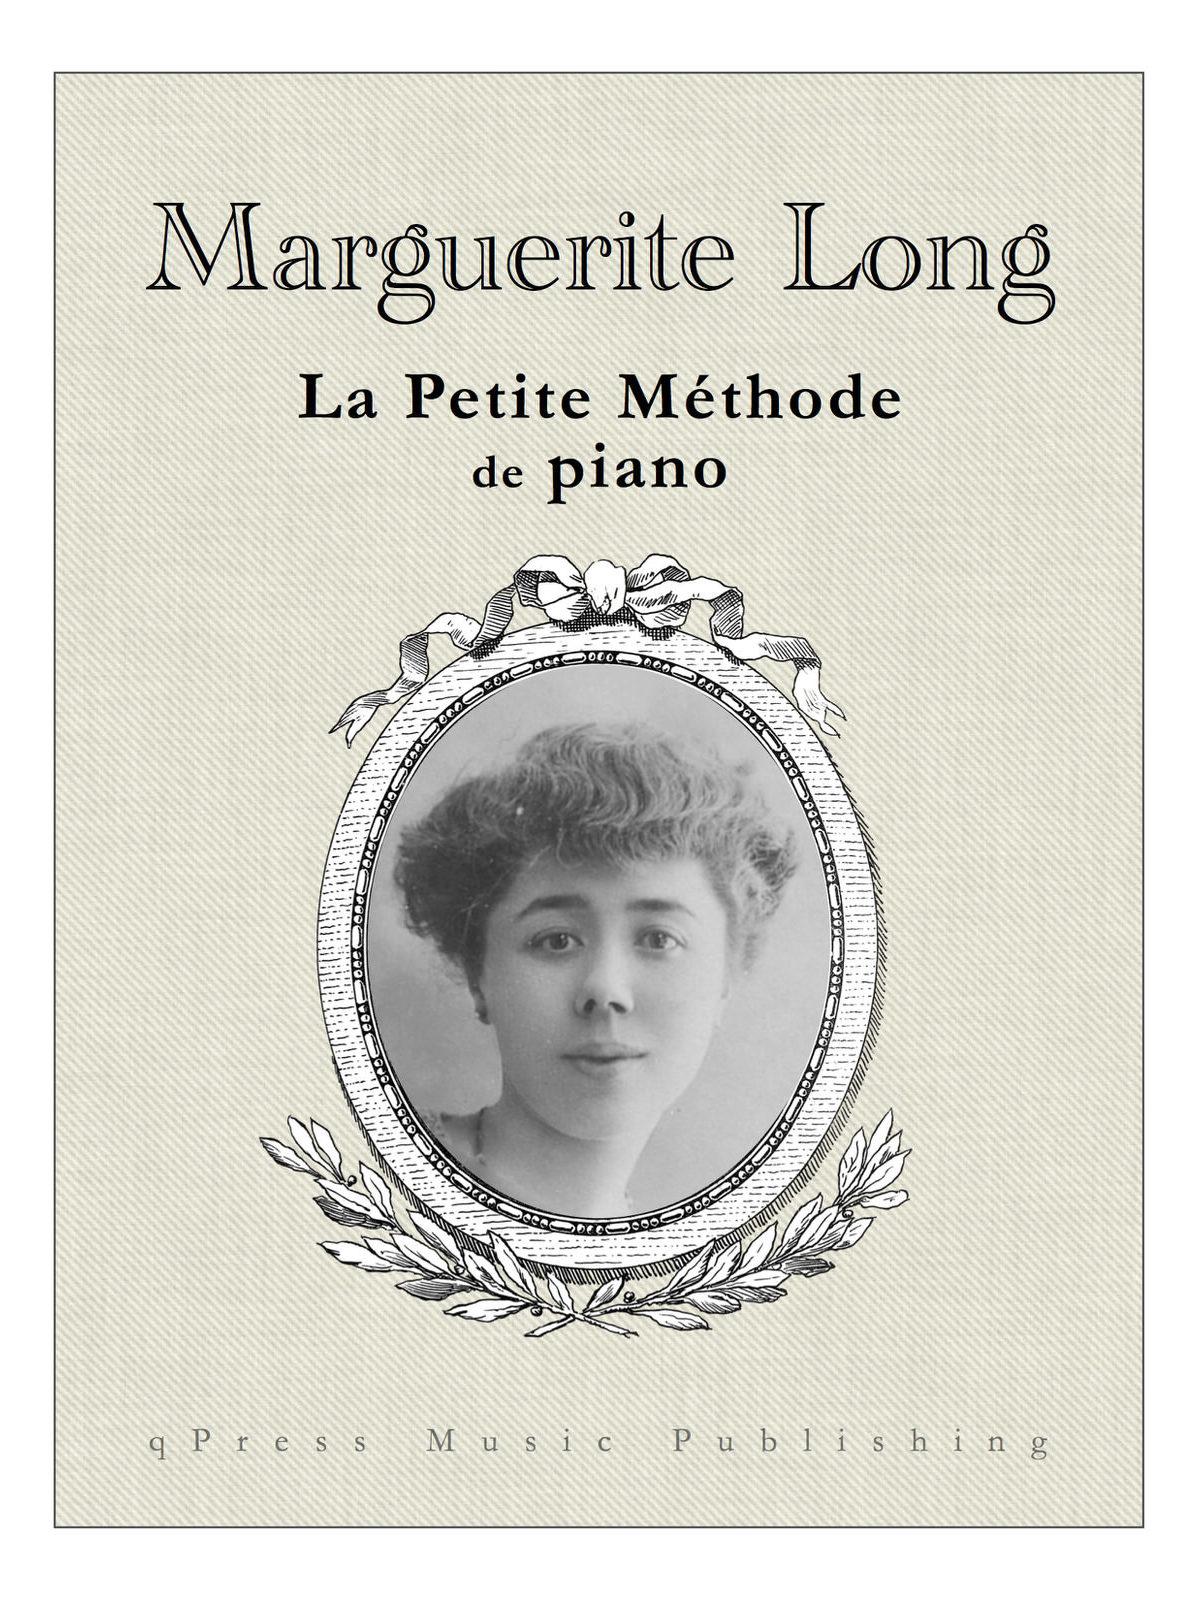 Long, La Petite Methode de Piano-p001